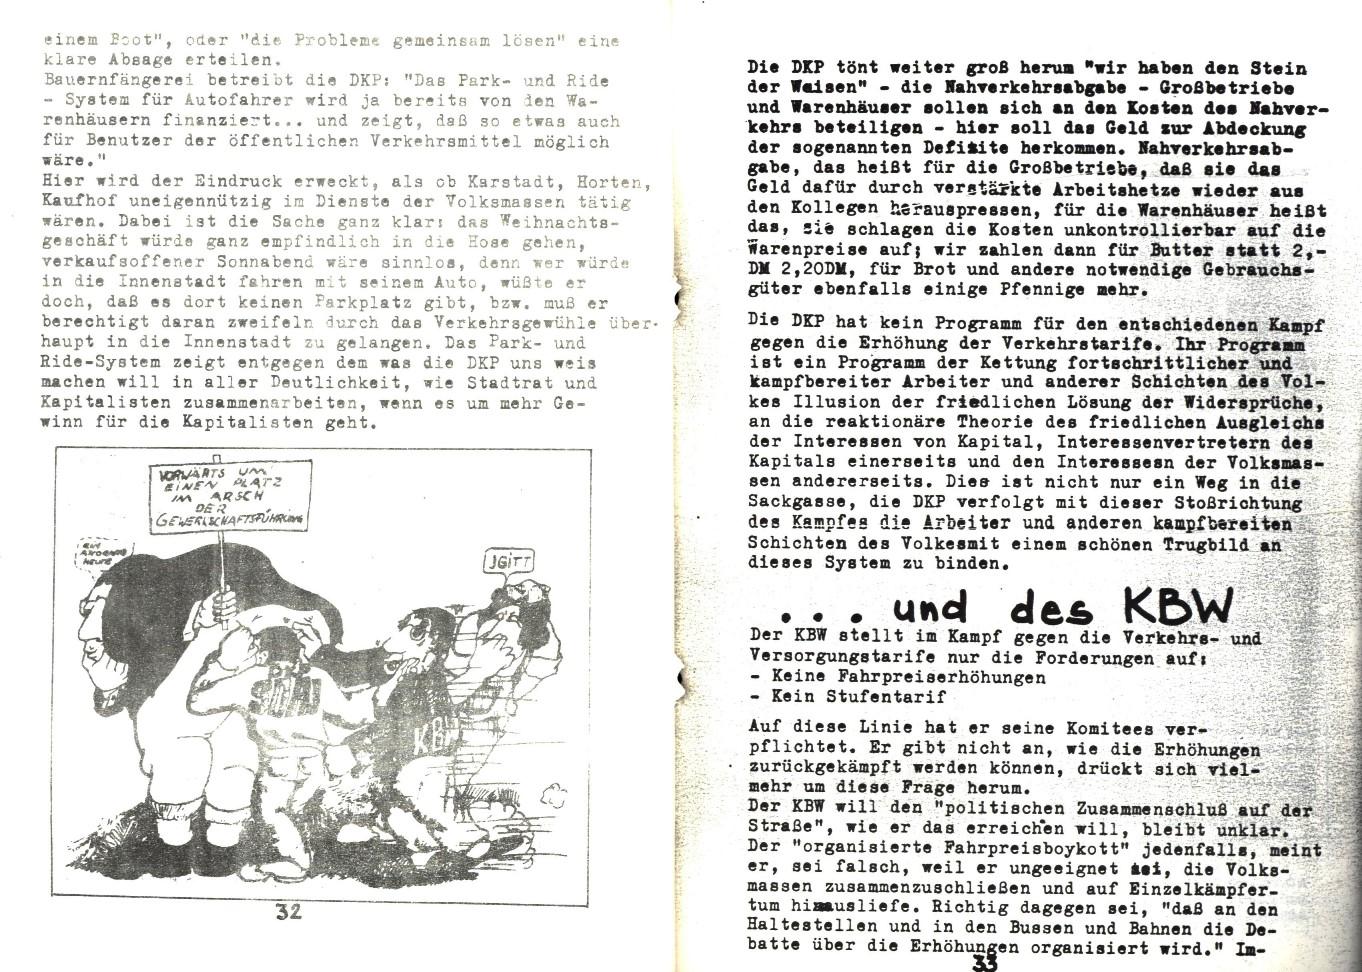 Hannover_AO_1975_Fahrpreisboykott_20